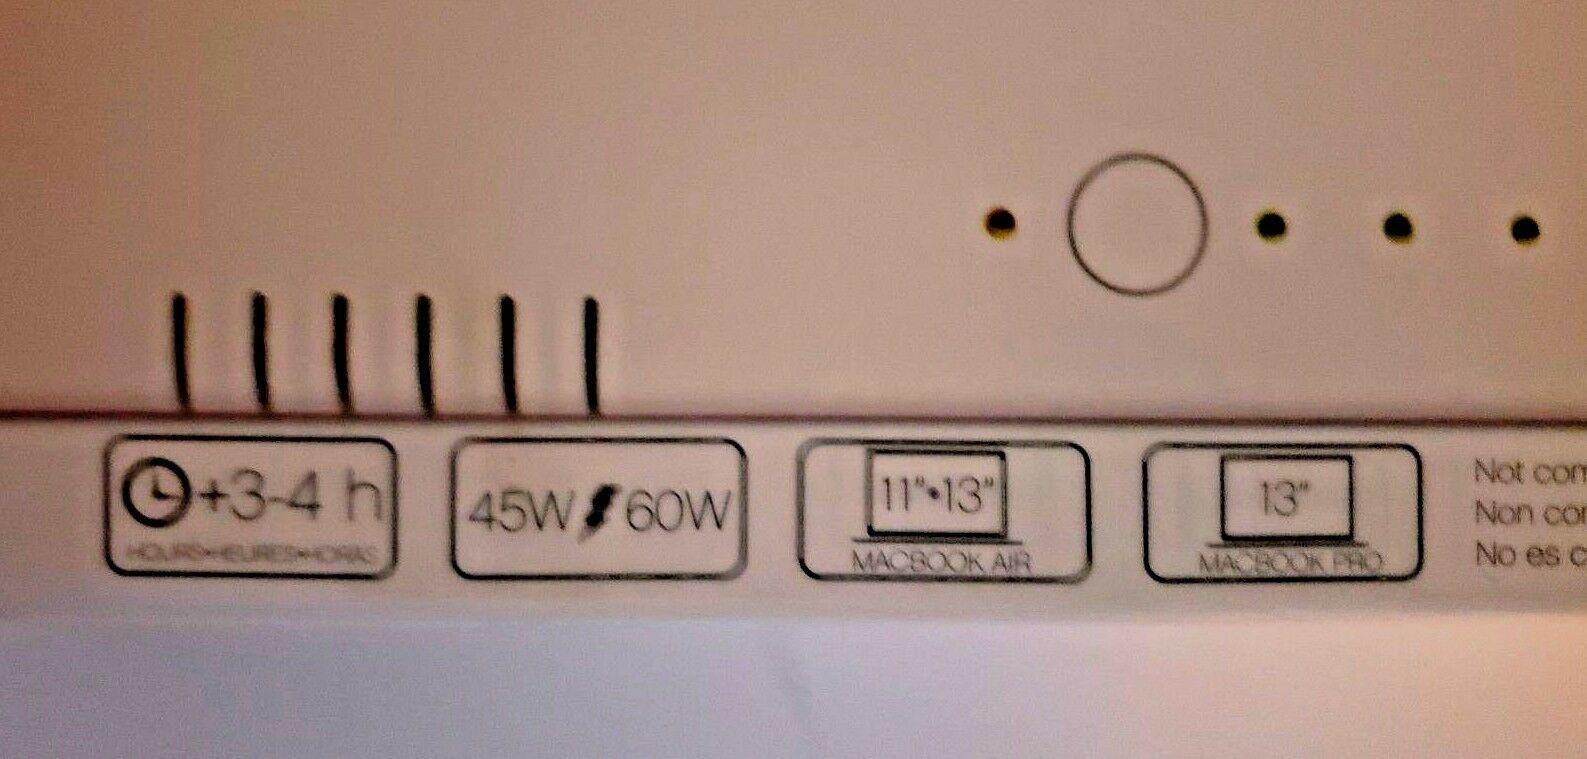 Lenmar Undead Power Chug Plug Apple Macbook Portable Power Charger PPWMB65 image 6